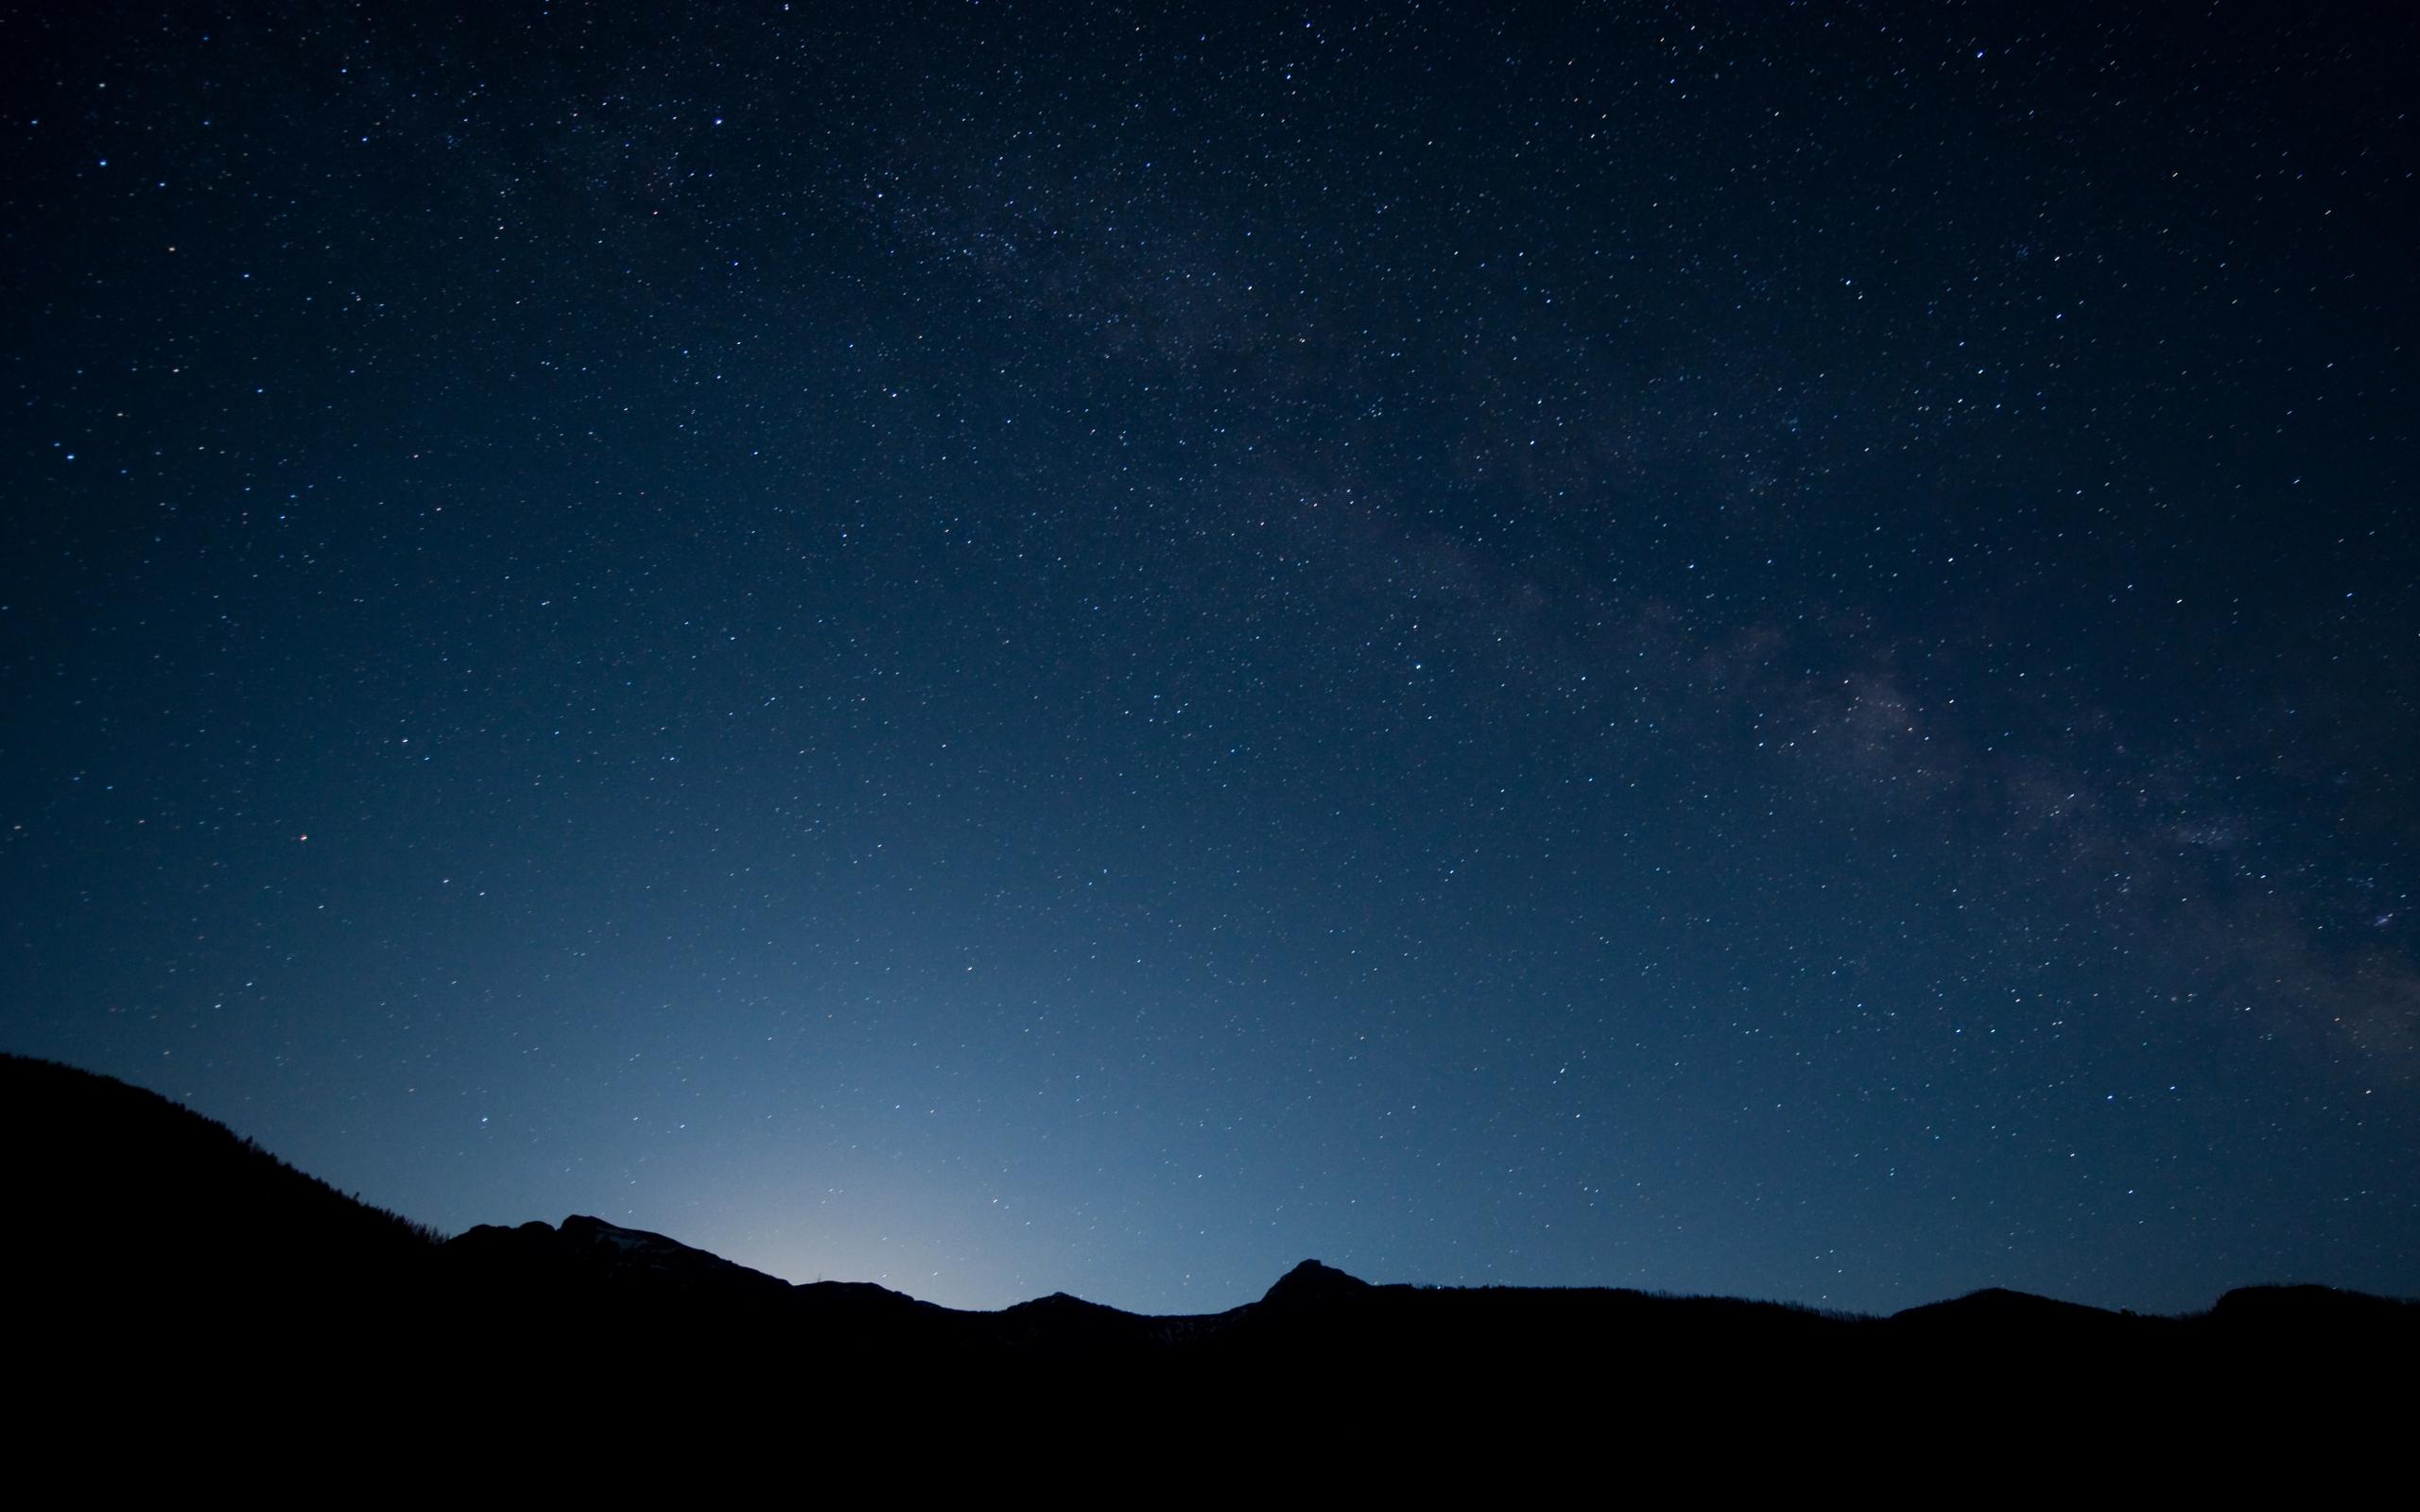 sky wallpaper night sky hd widescreen and normal resolution wallpaper 2560x1600